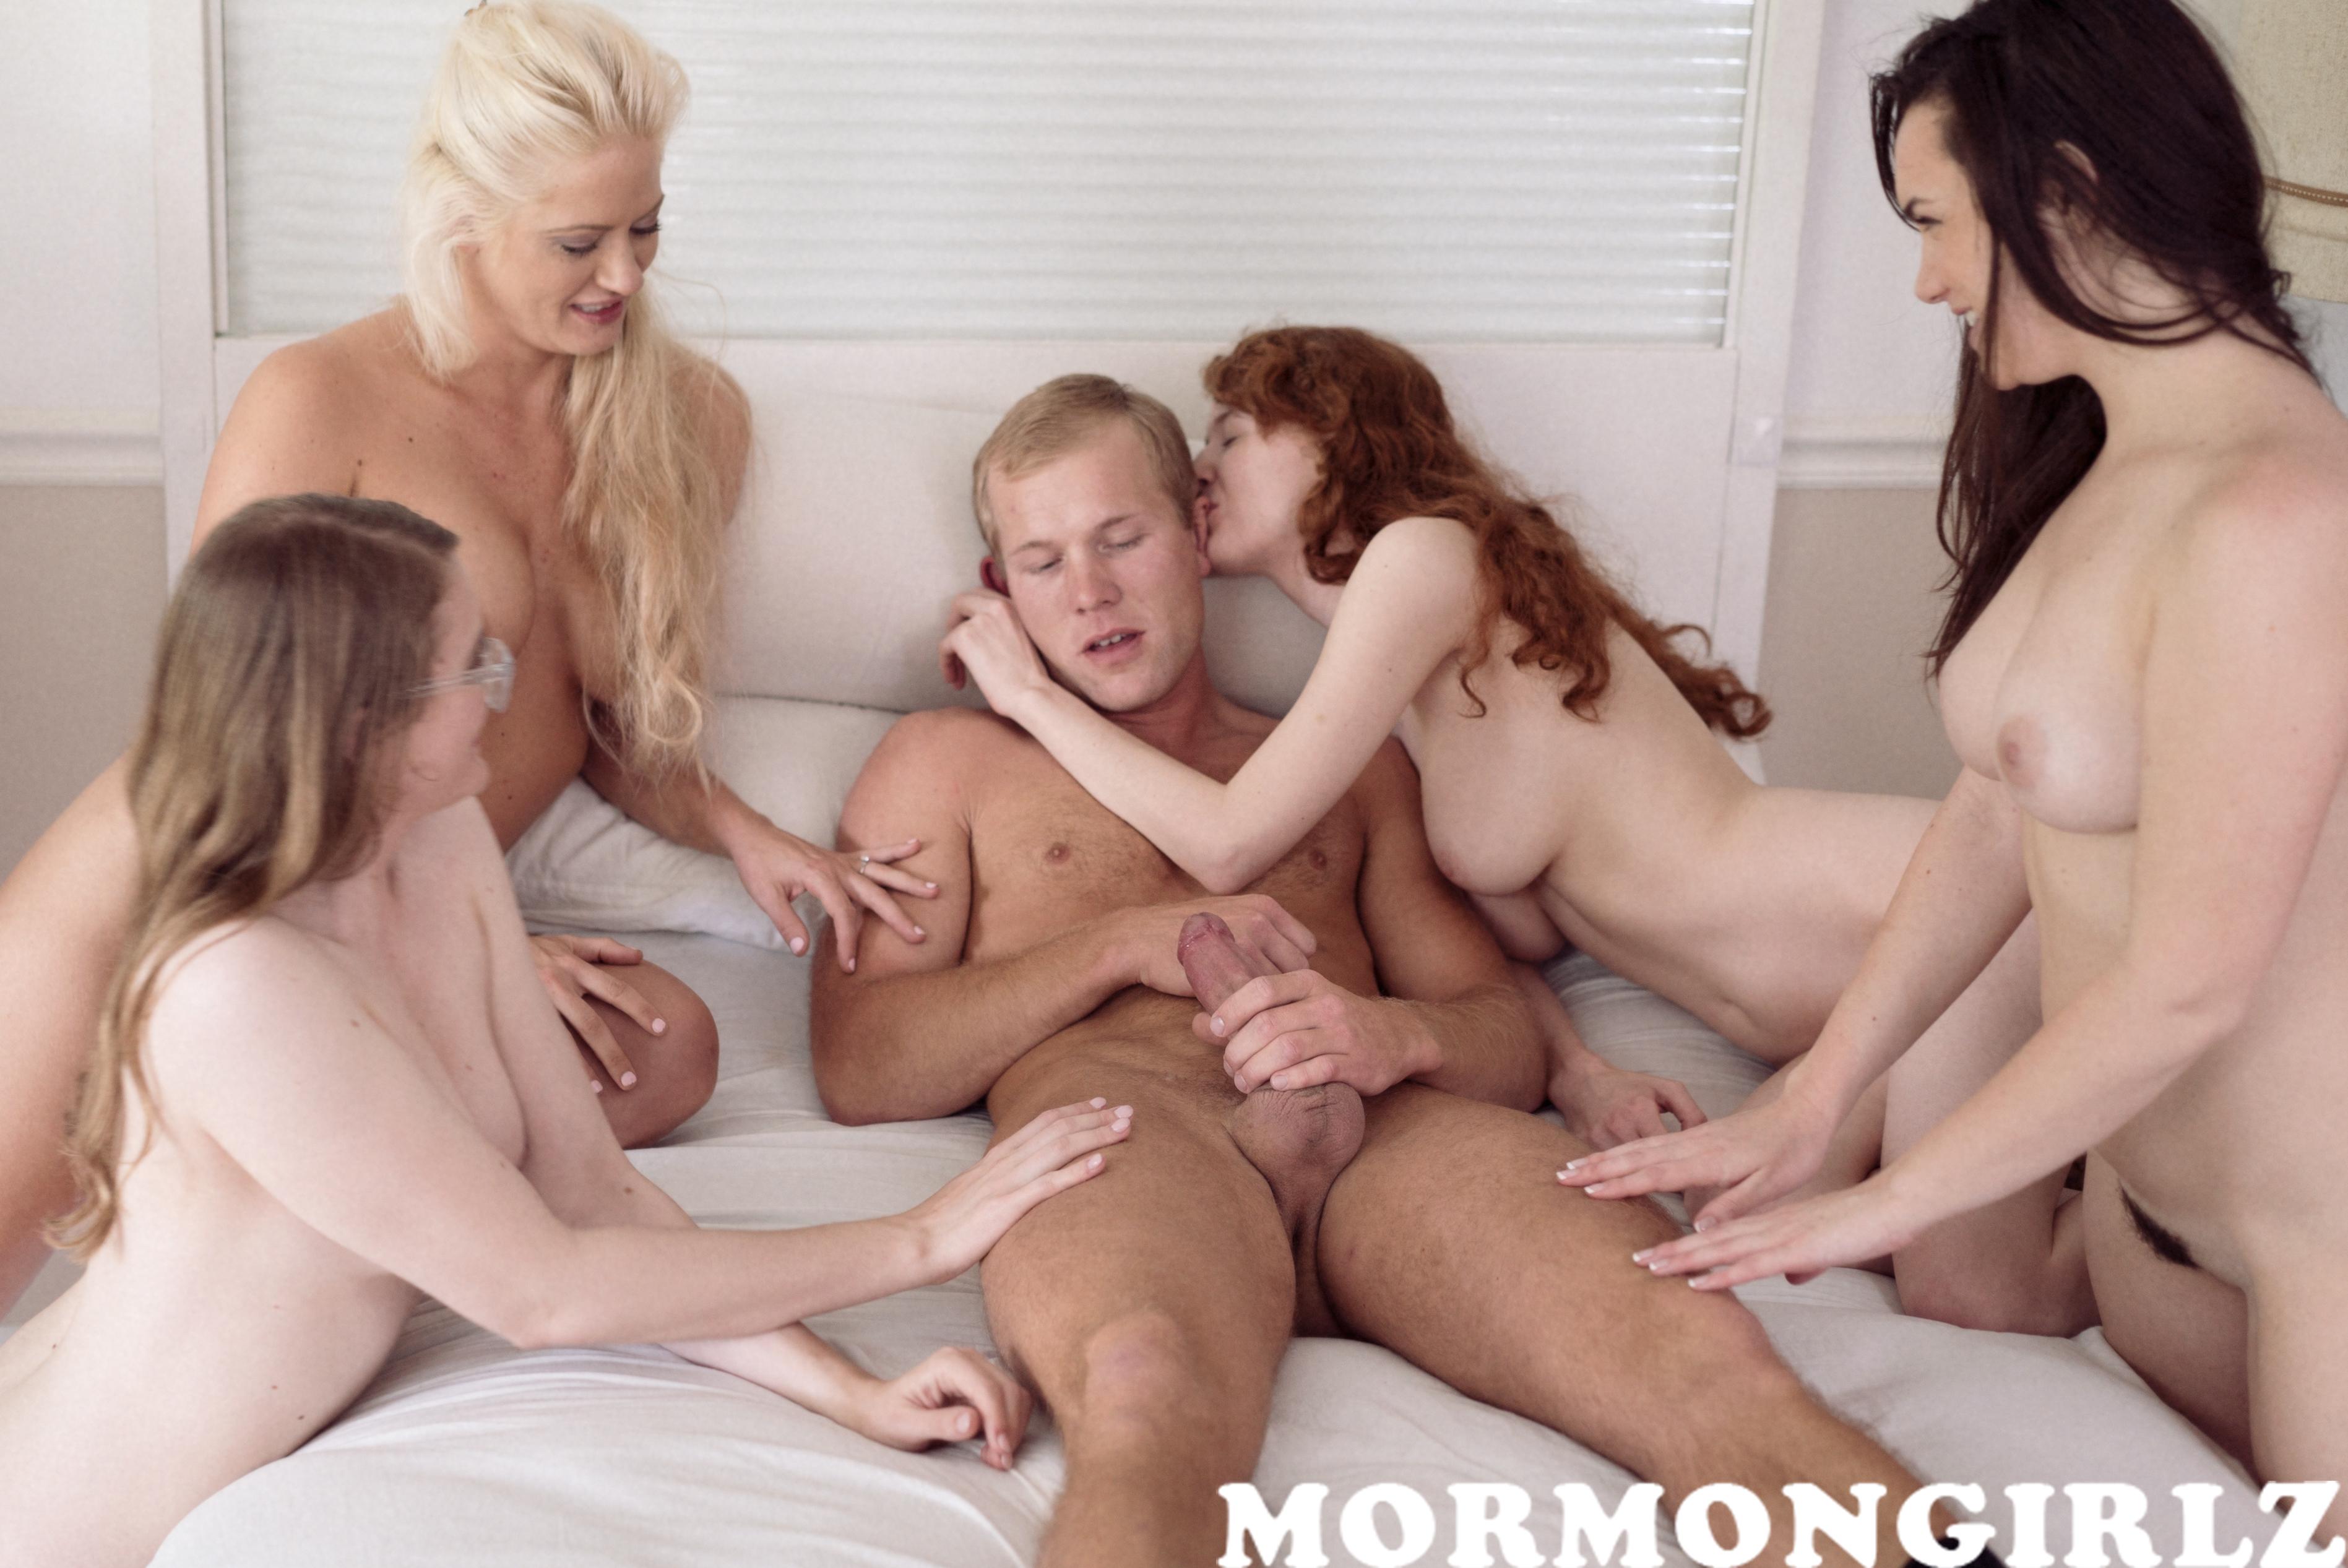 mormons having sex porn free